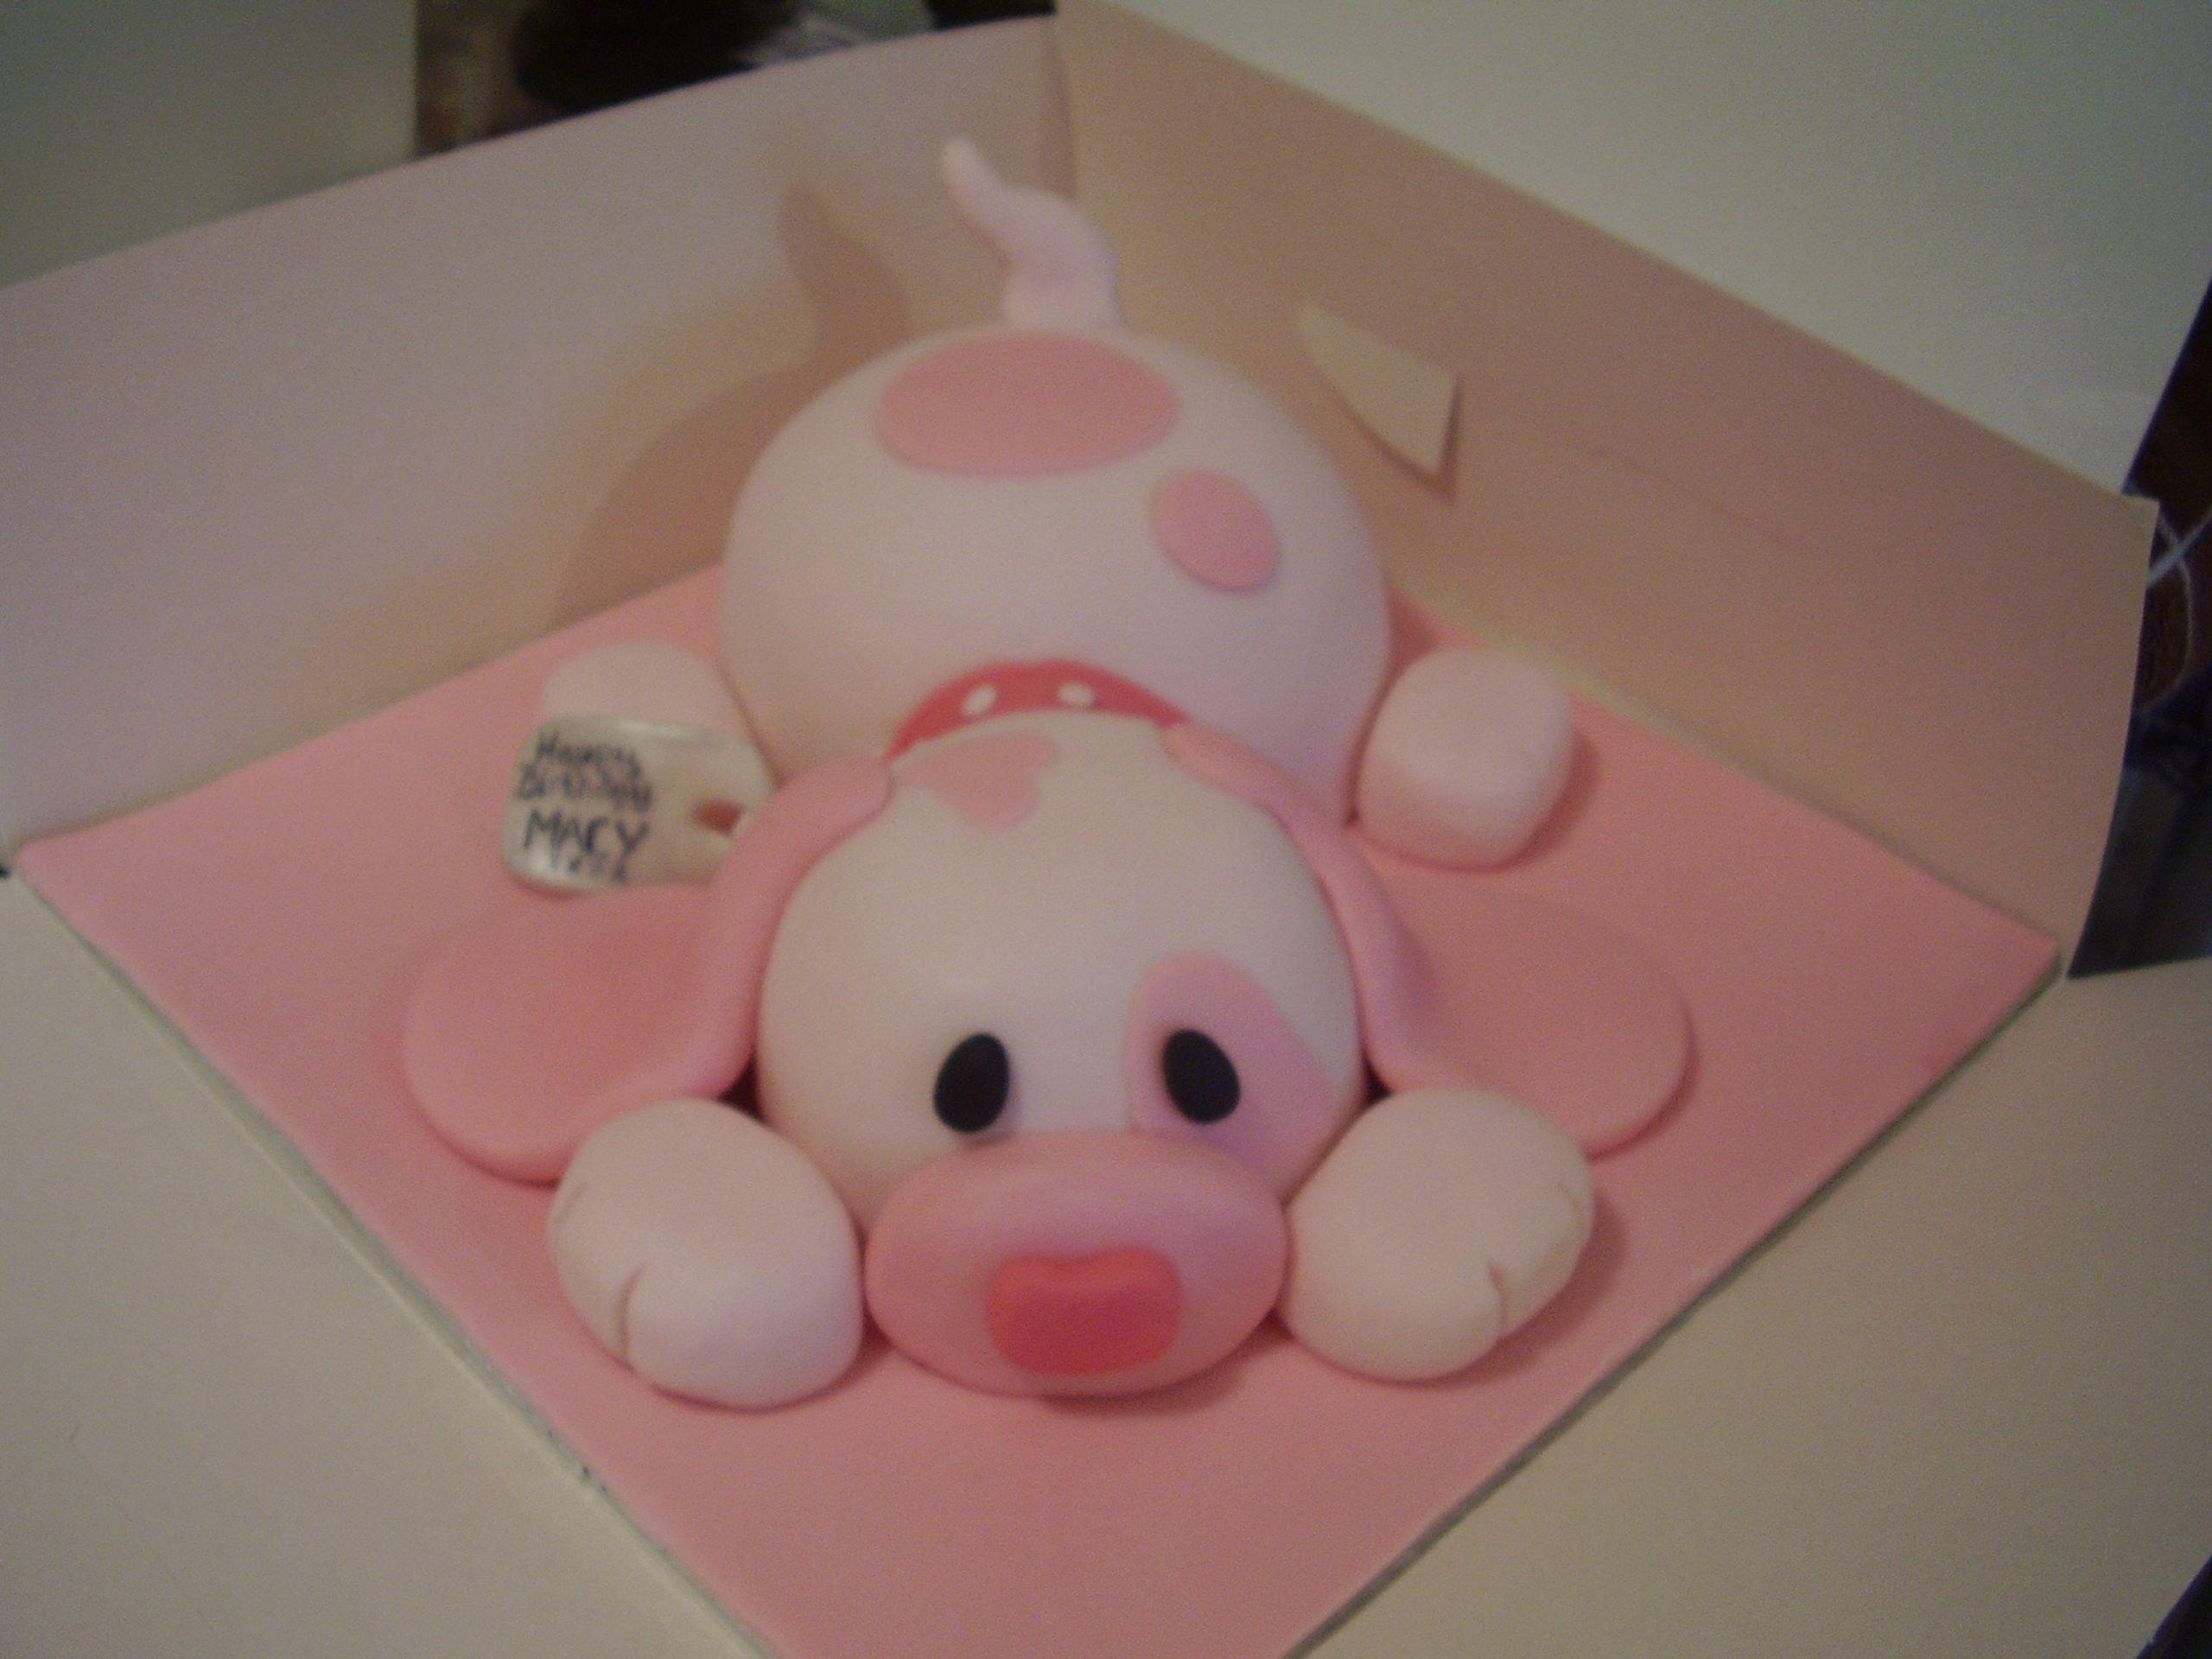 Puppy cake d my first puppy cake flor pinterest puppy cake